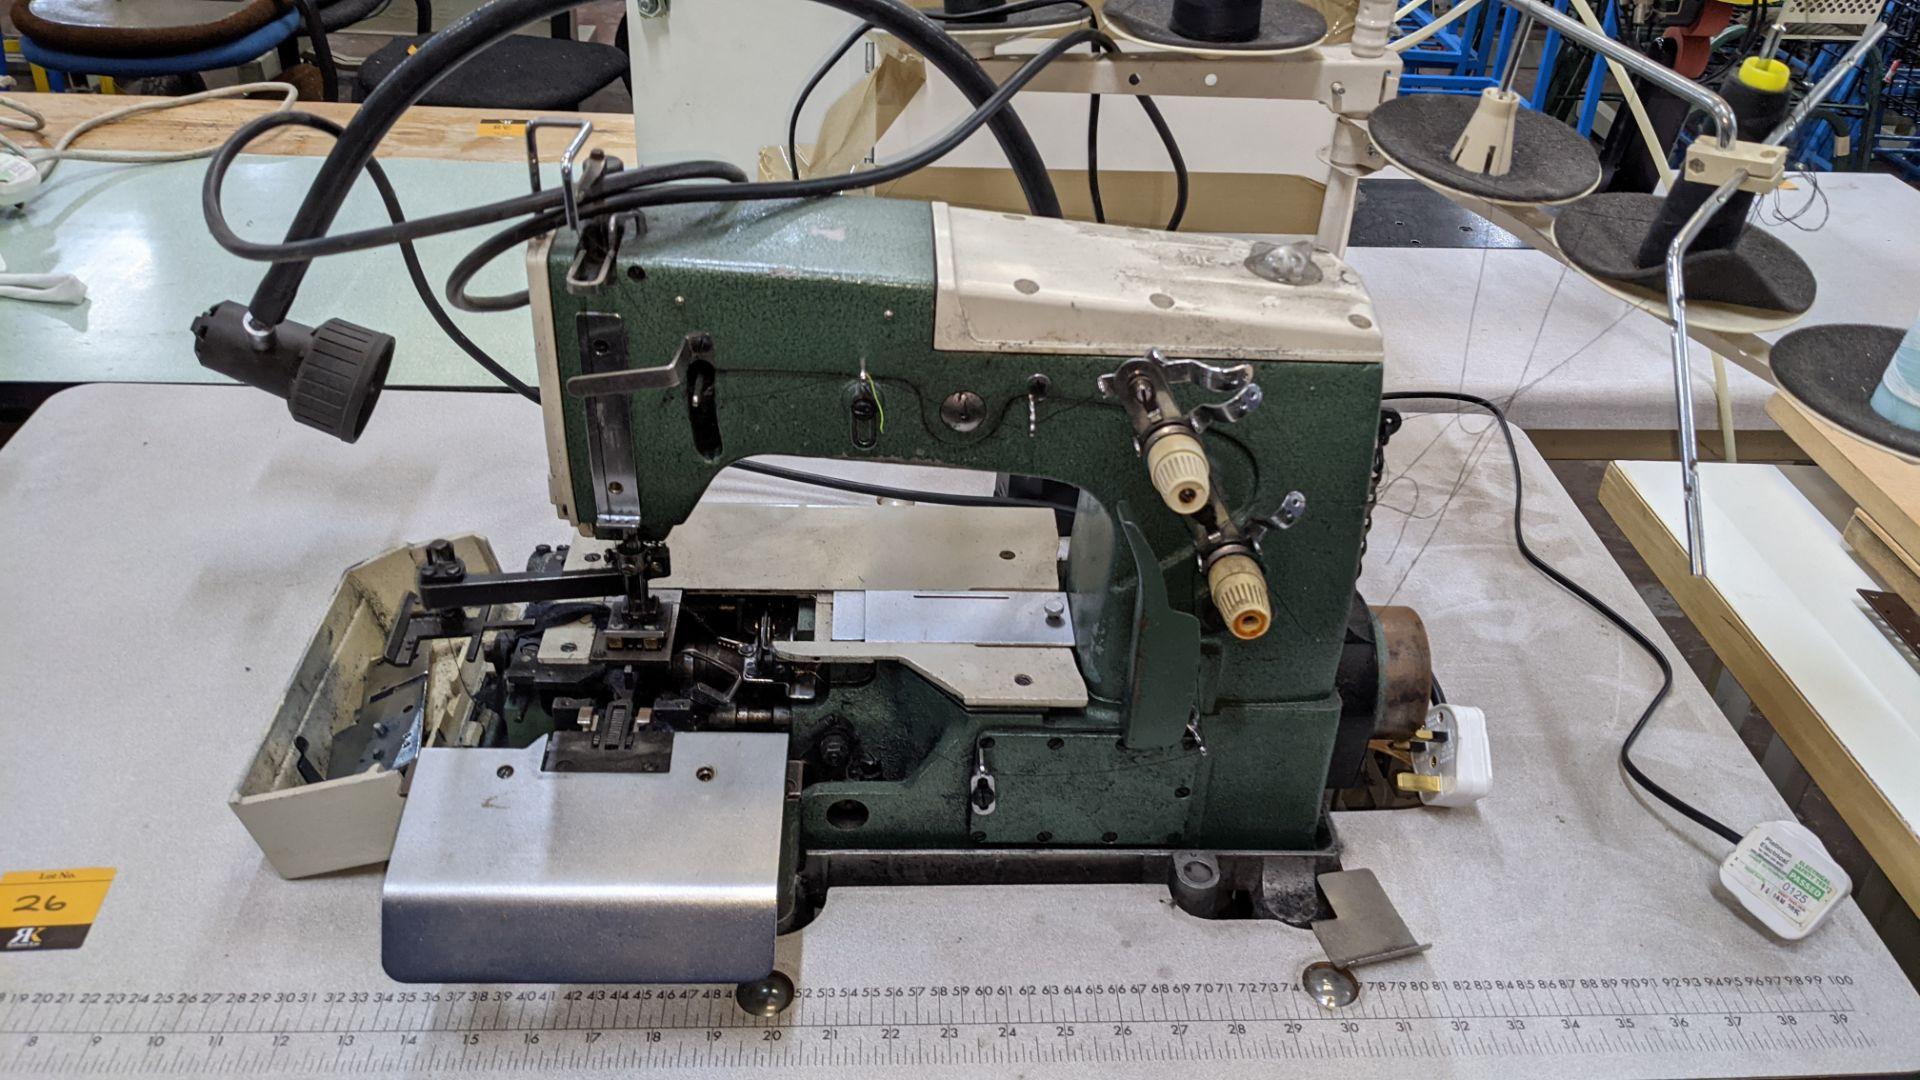 Sewing machine - Image 4 of 16